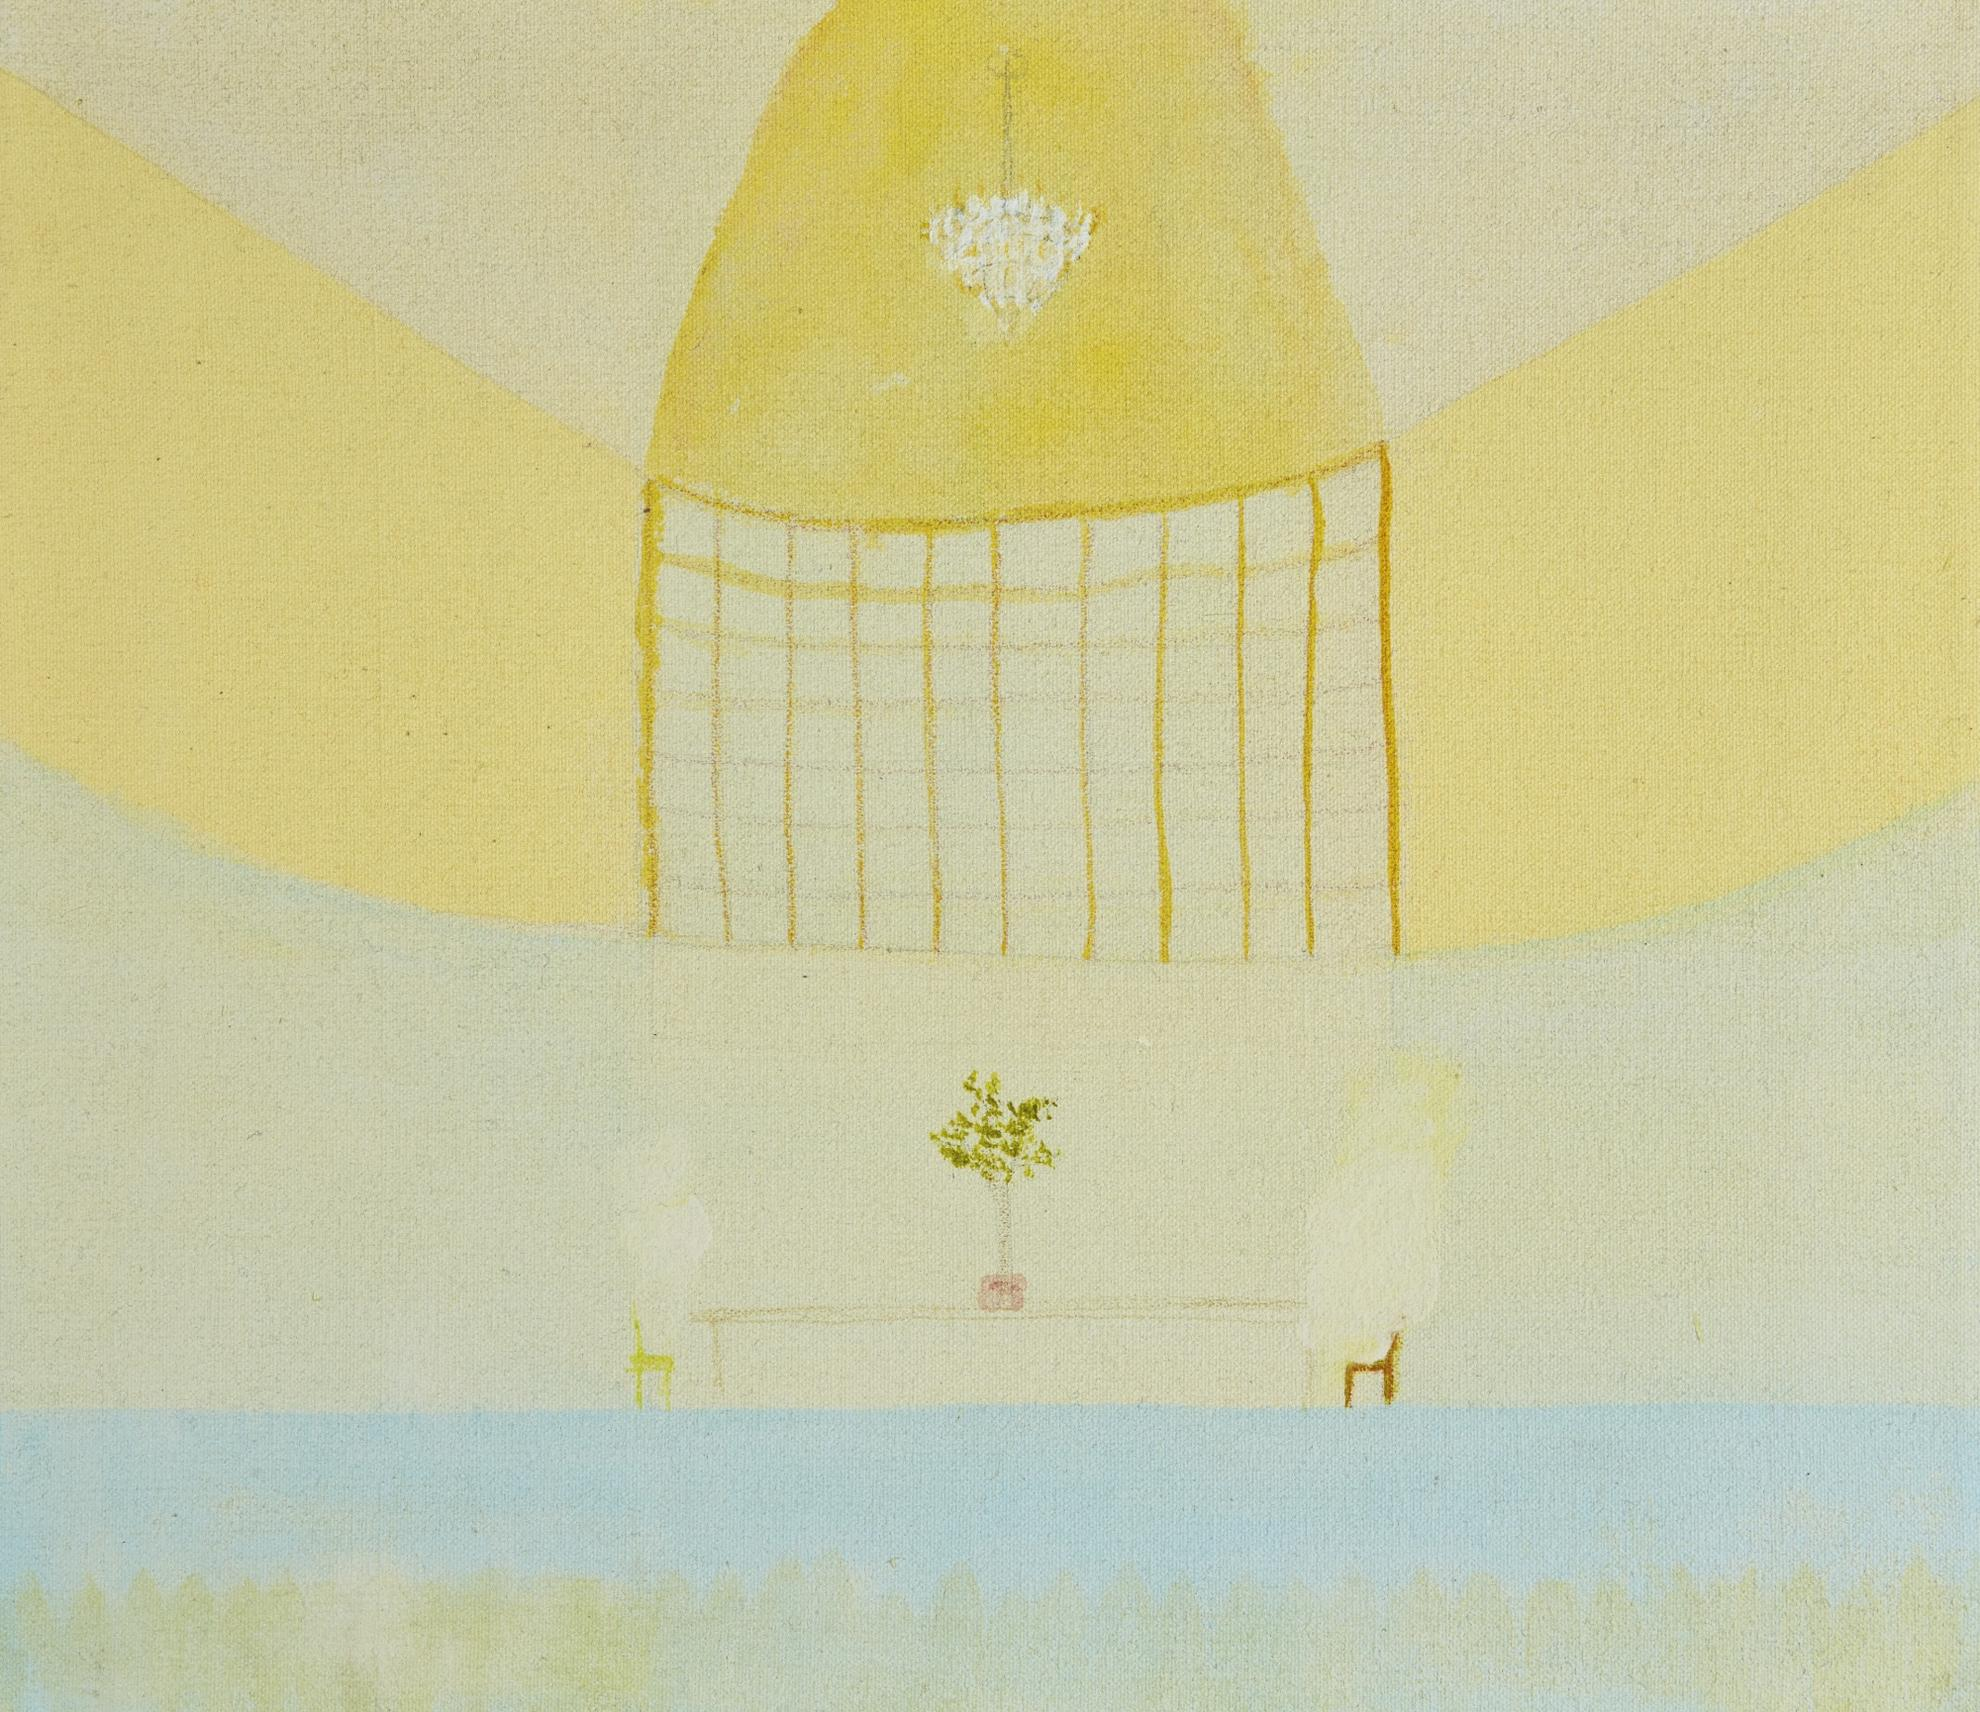 Hiroshi Sugito-The Plant-1997